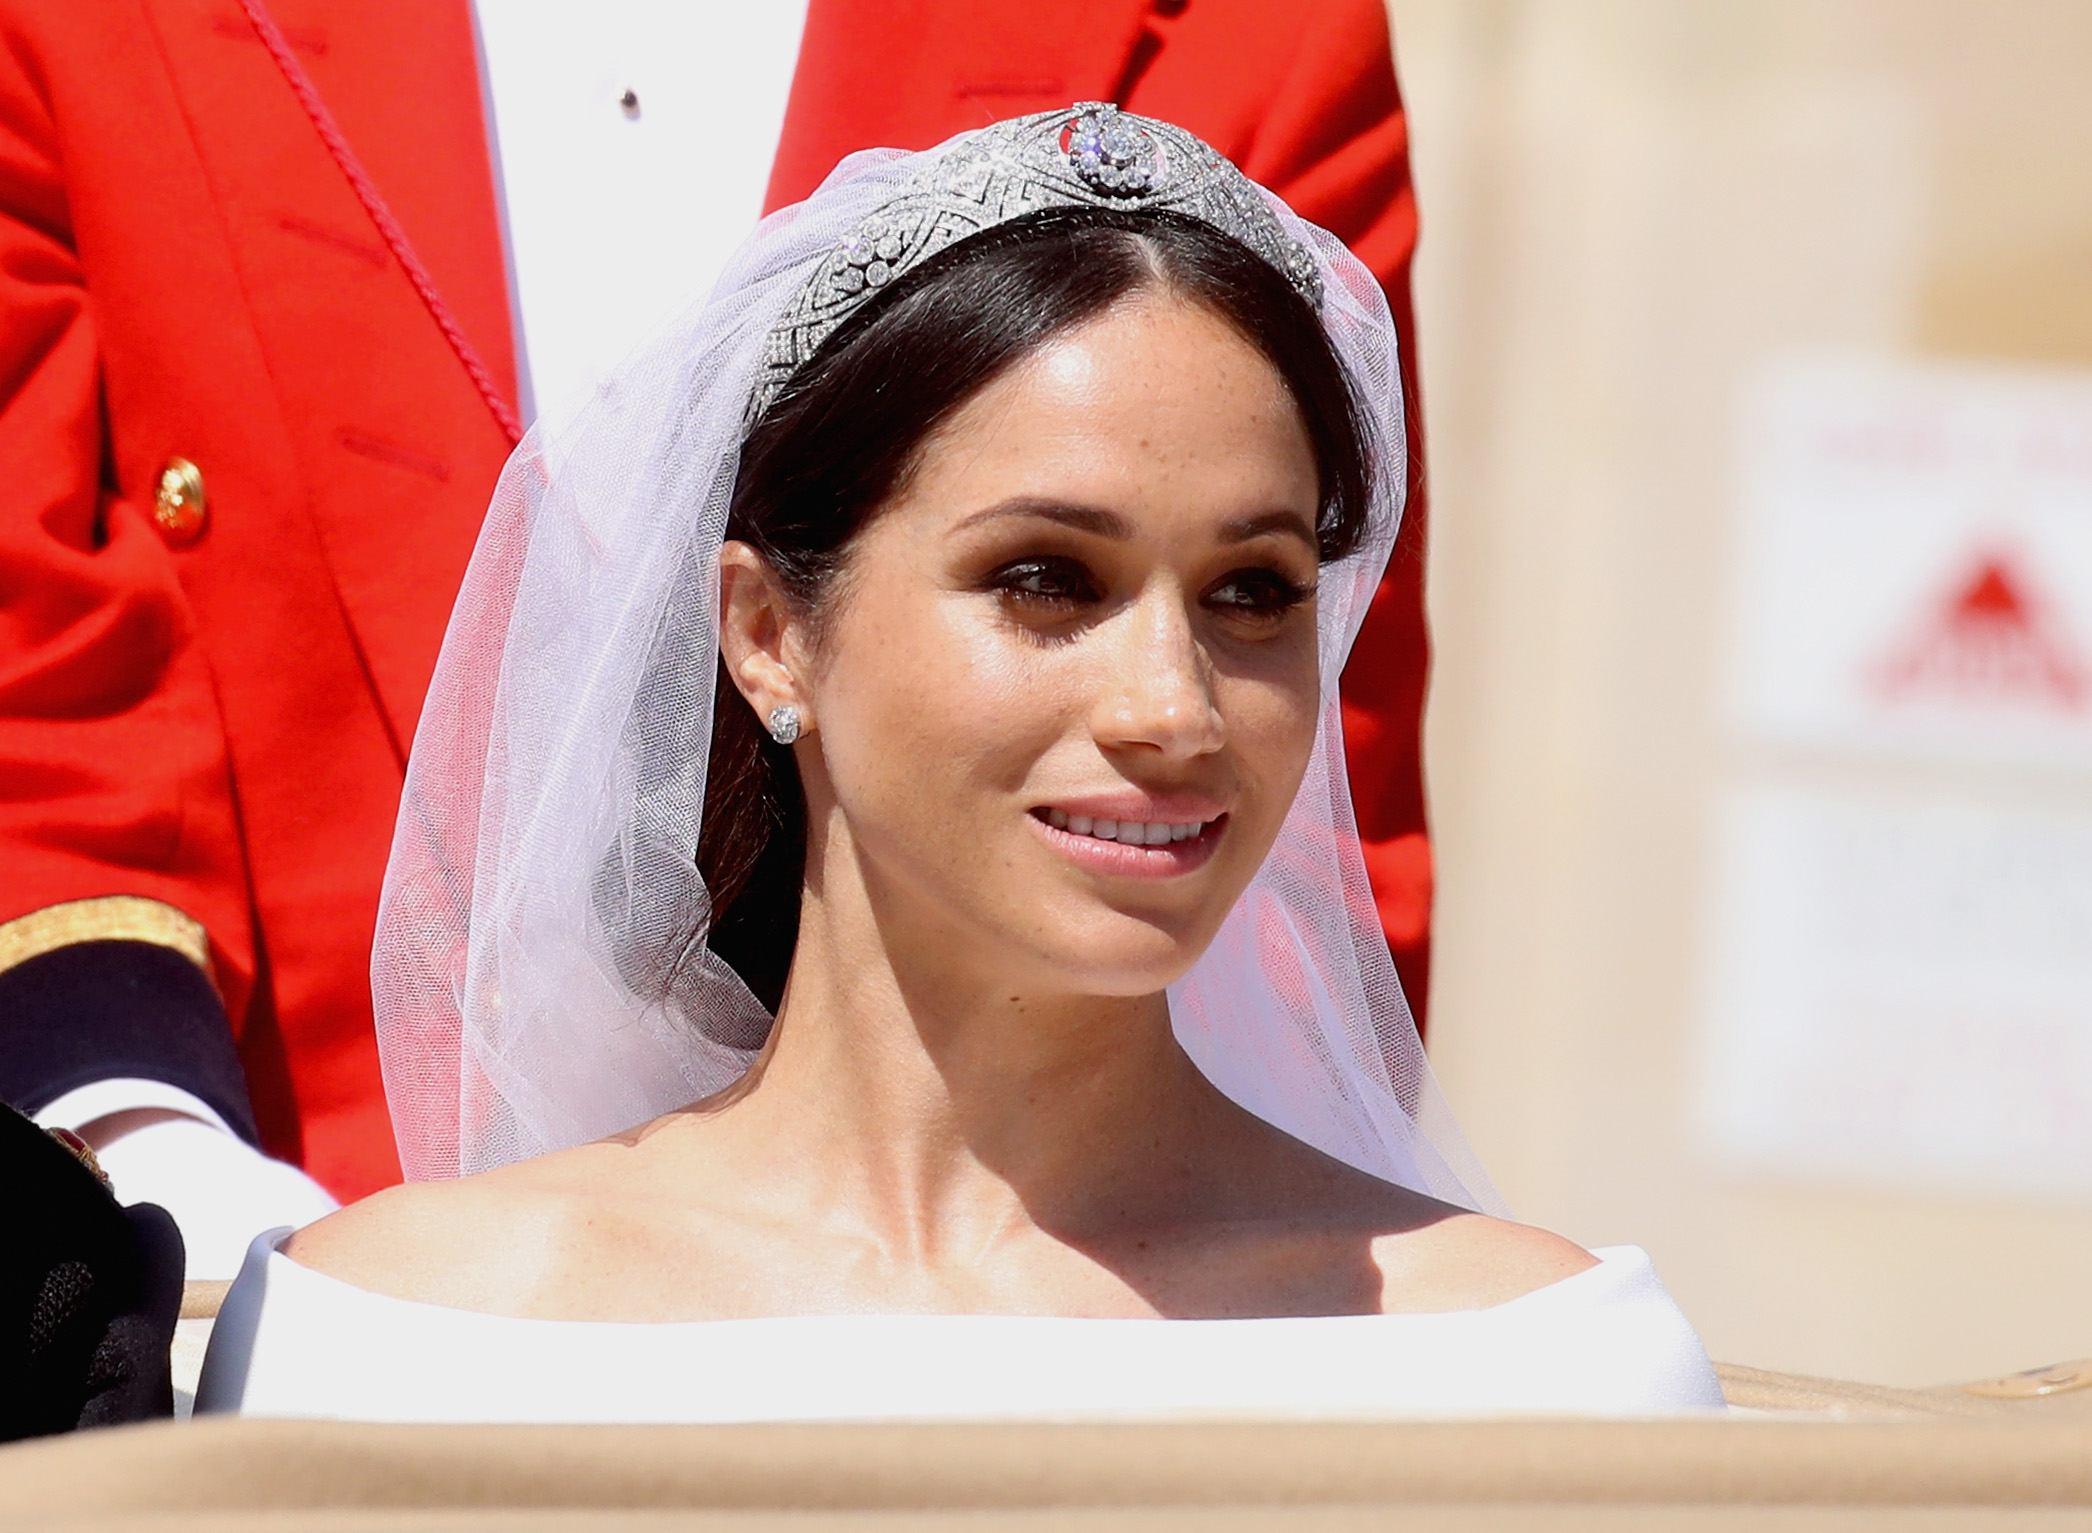 Meghan Markle on her wedding day